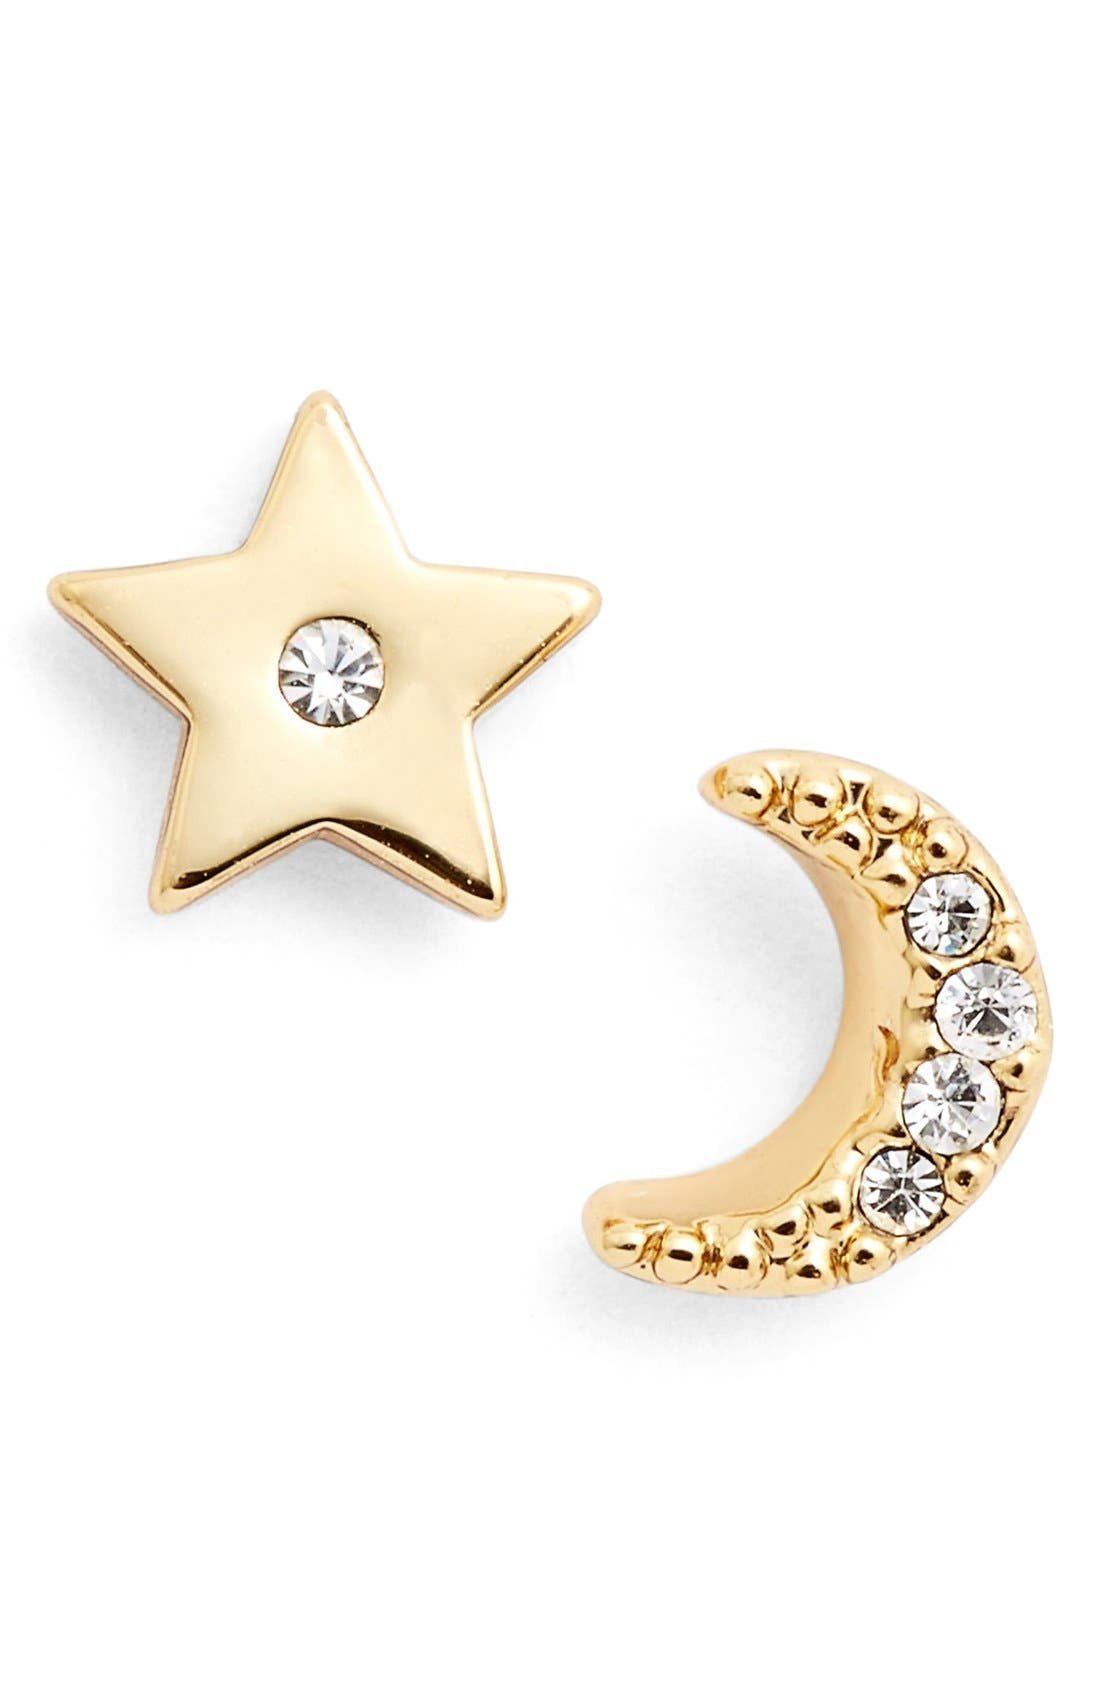 Main Image - kate spade new york 'star and moon' asymmetrical stud earrings